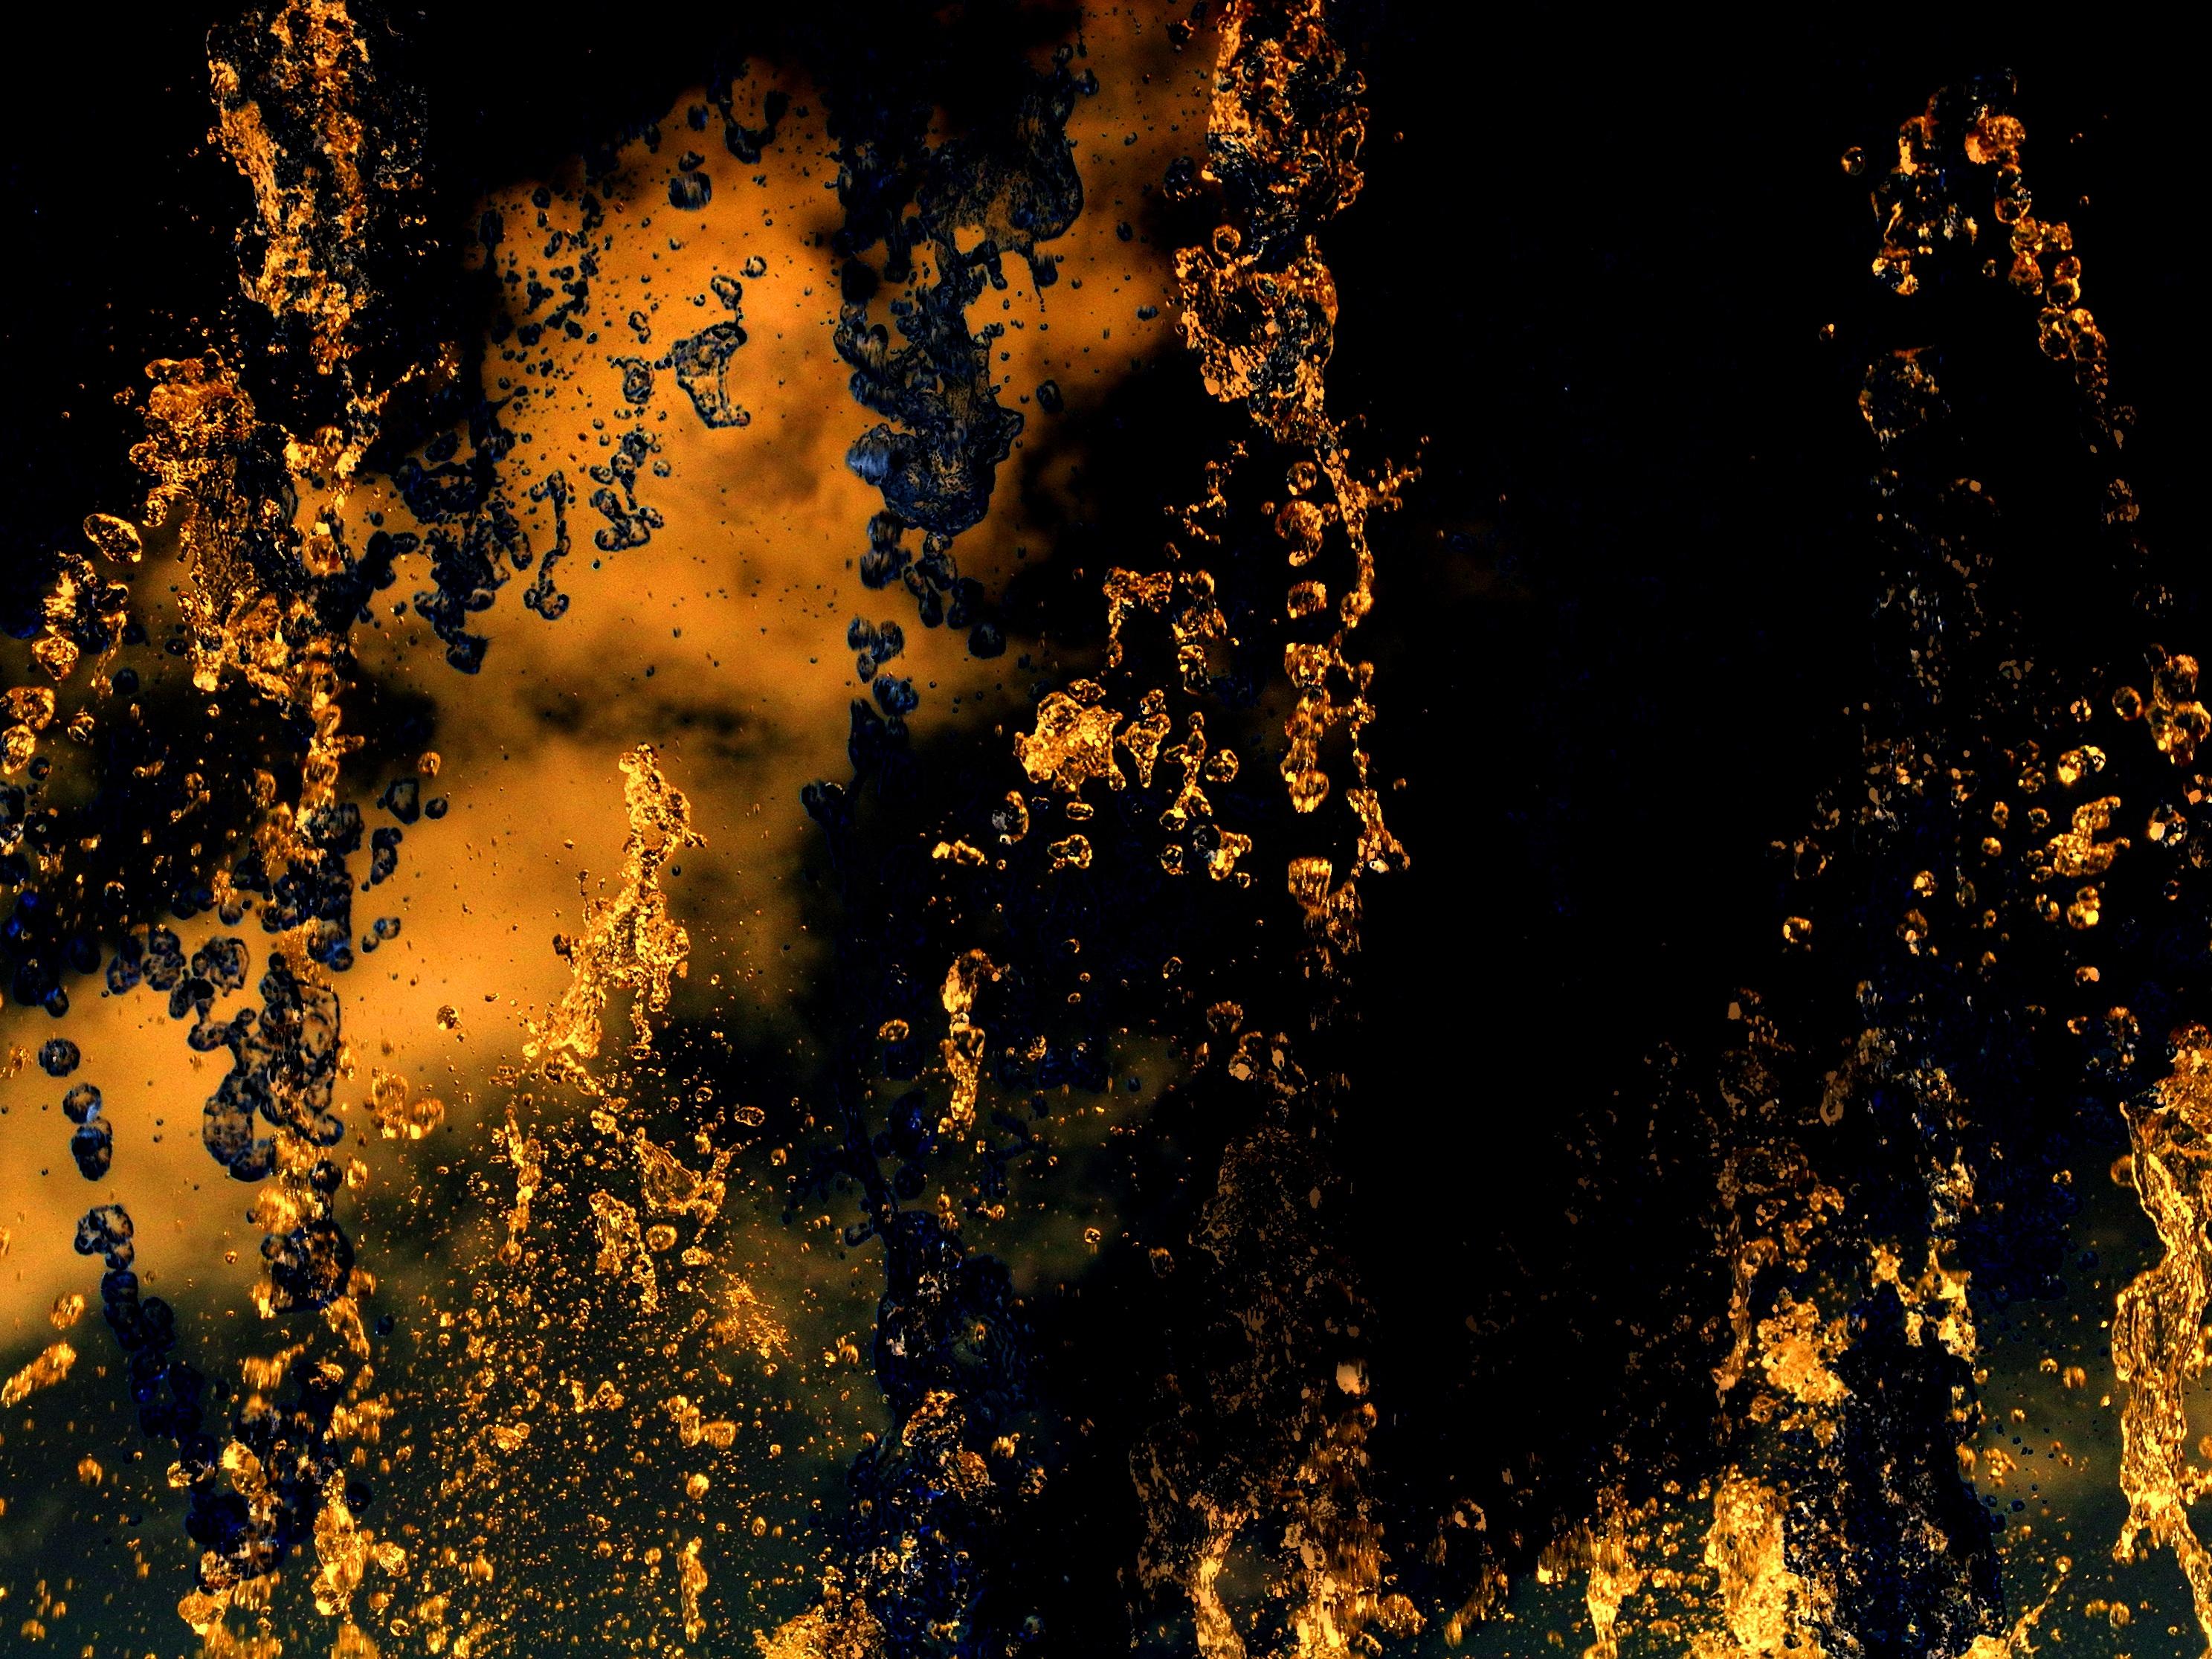 103649 download wallpaper Macro, Spray, Splash, Dark, Liquid screensavers and pictures for free